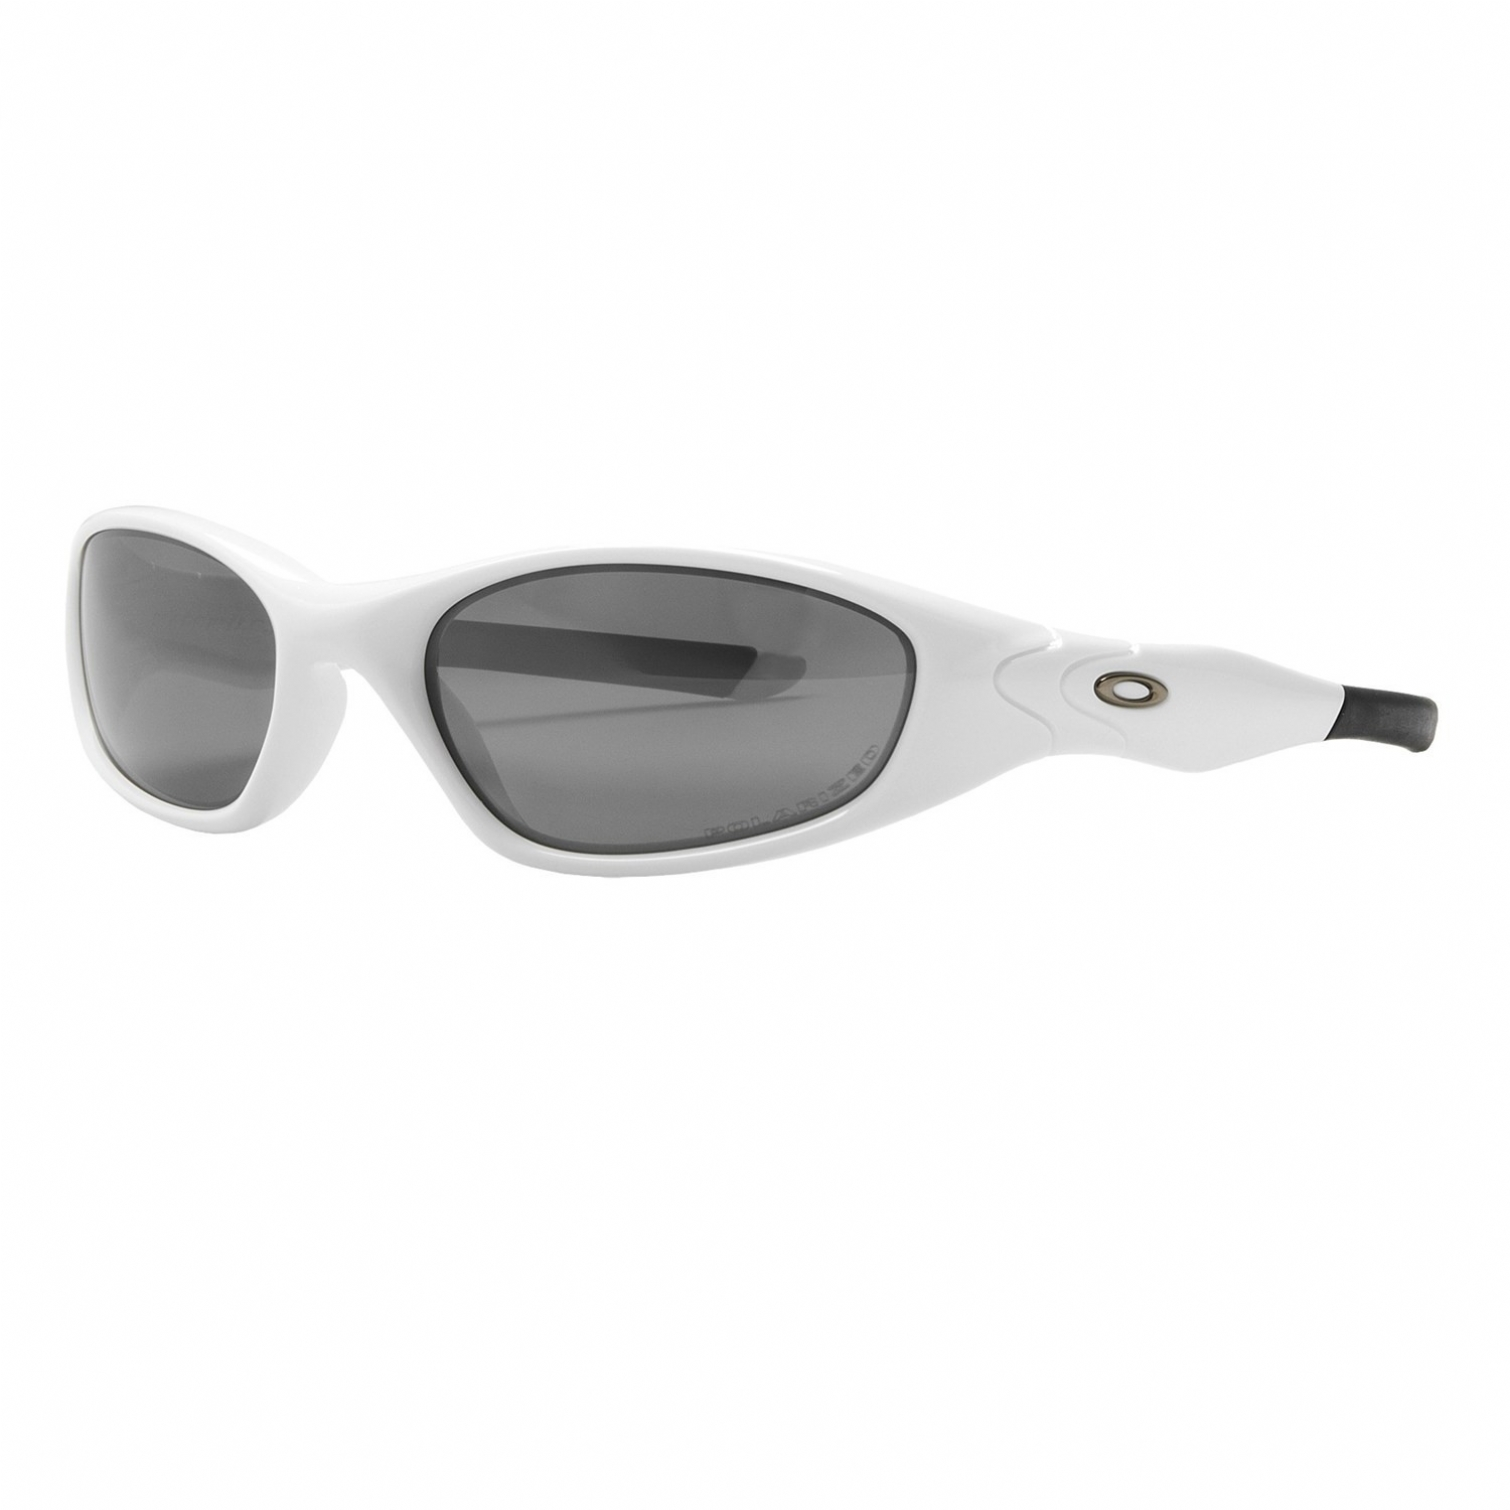 856169eecbba Oakley Minute 2.0 Sunglasses